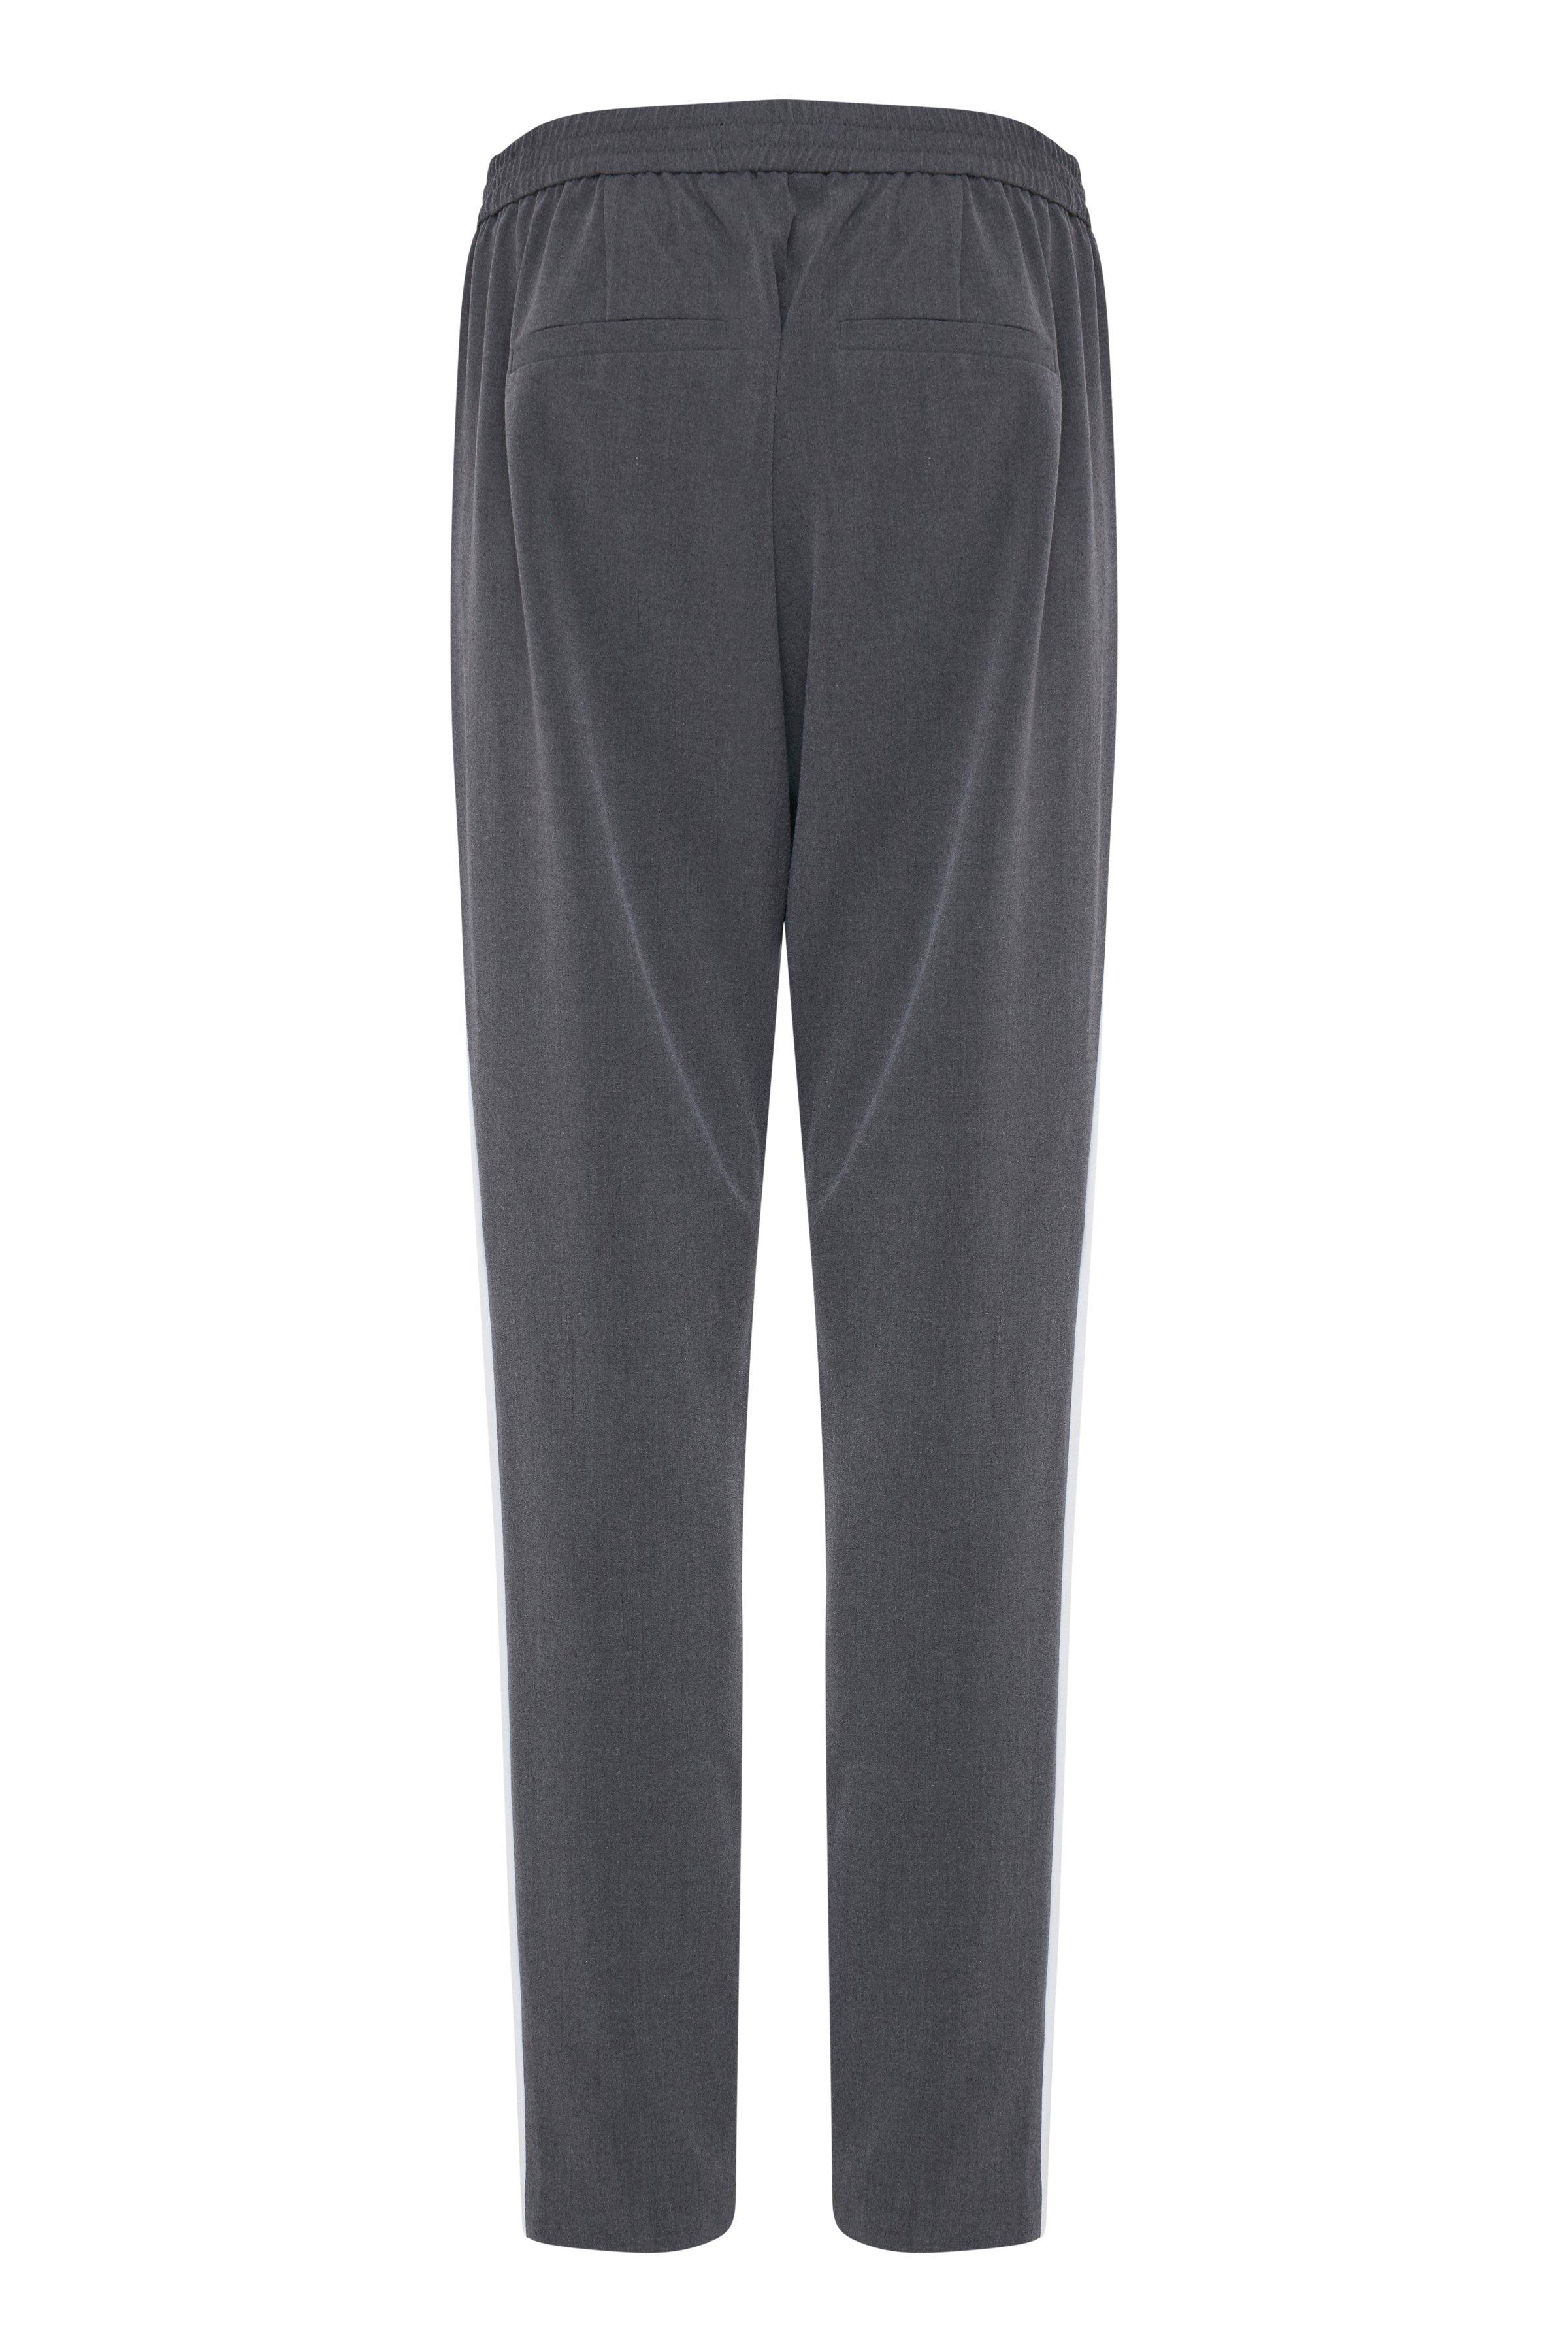 Dark Grey Mel. comb Pants Casual fra b.young – Køb Dark Grey Mel. comb Pants Casual fra str. 34-44 her